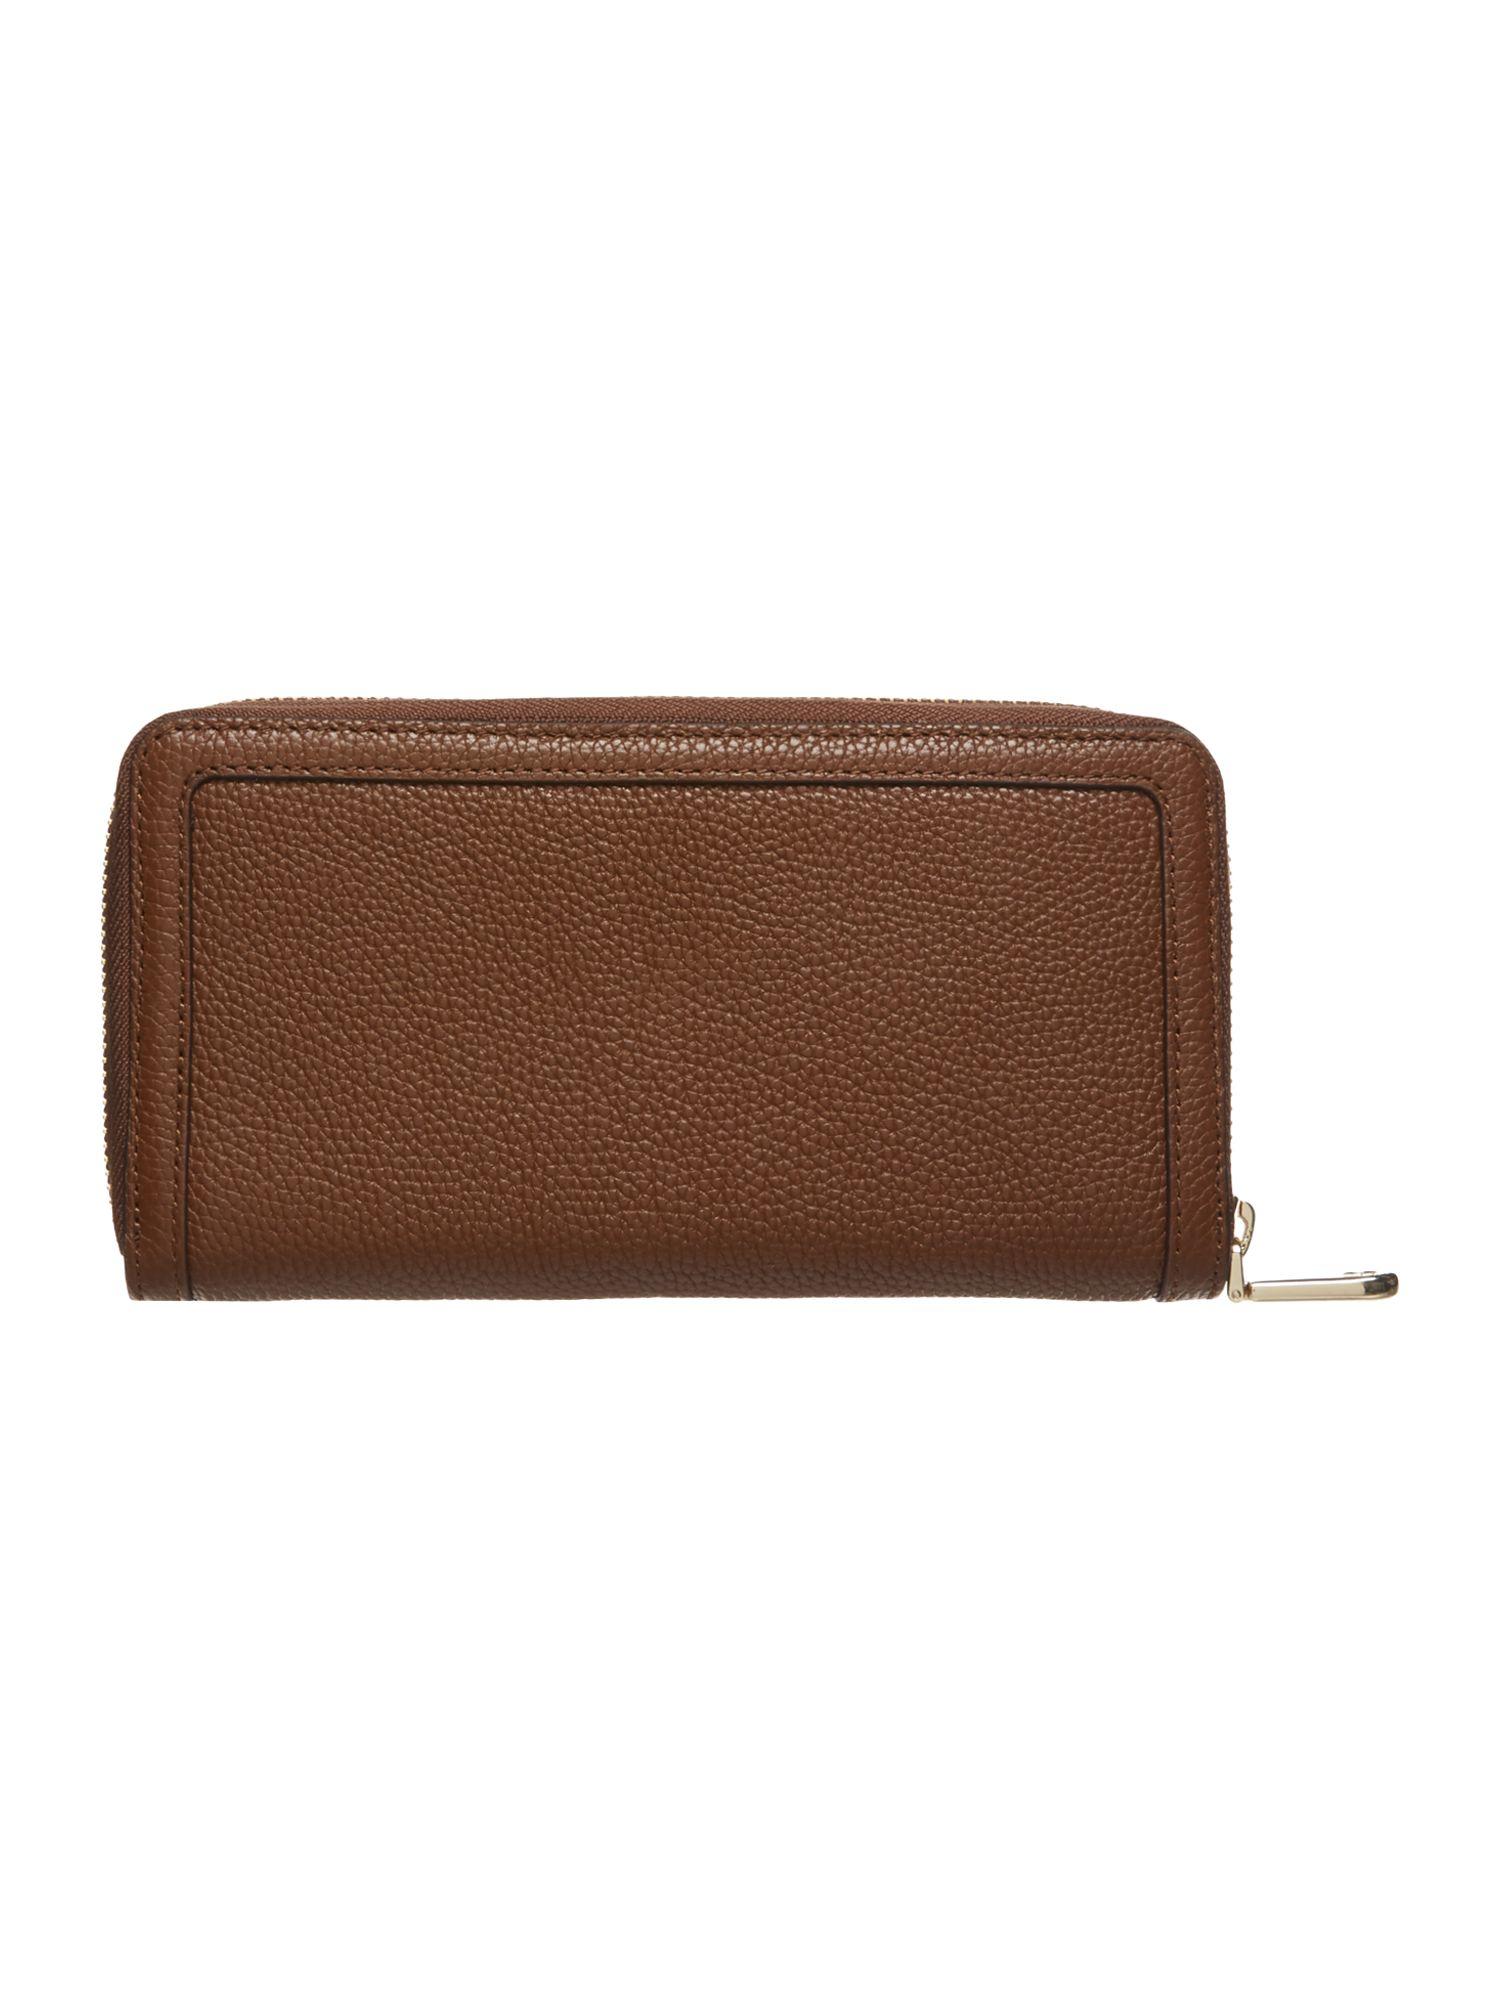 large tan purse